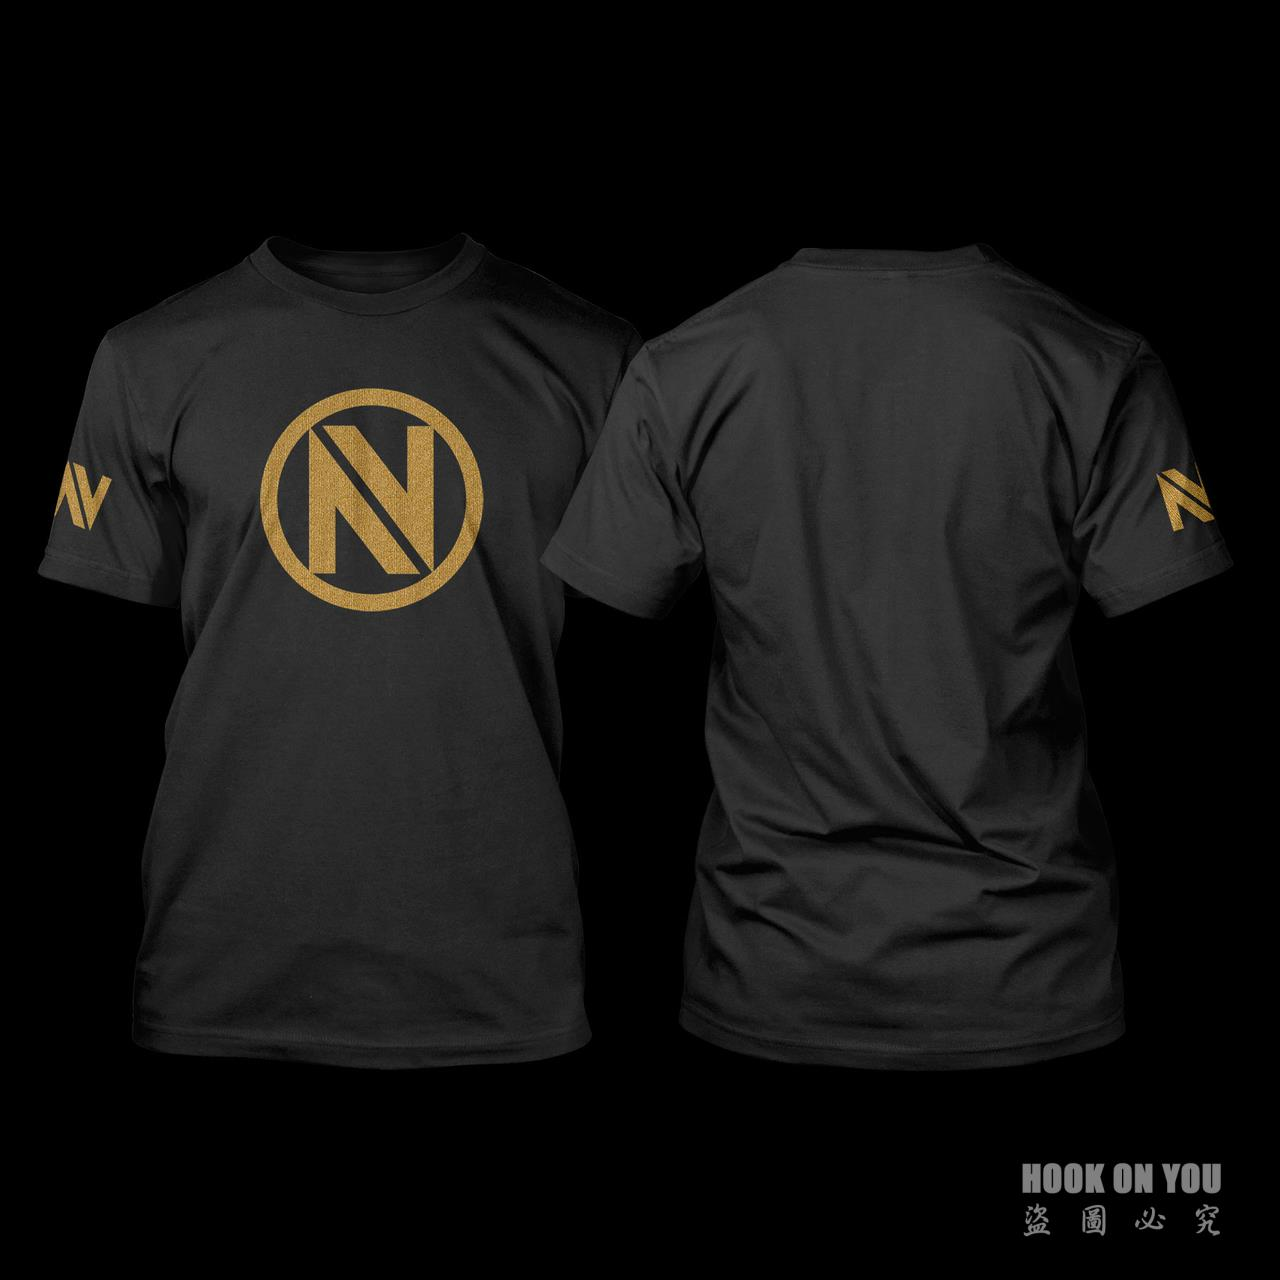 Design t shirt games online - Exclusive Design Cs Go Csgo Game Team Envyus Short Sleeve T Shirt Casual Fashion Gaming T Shirt Camiseta Top Tees Cotton